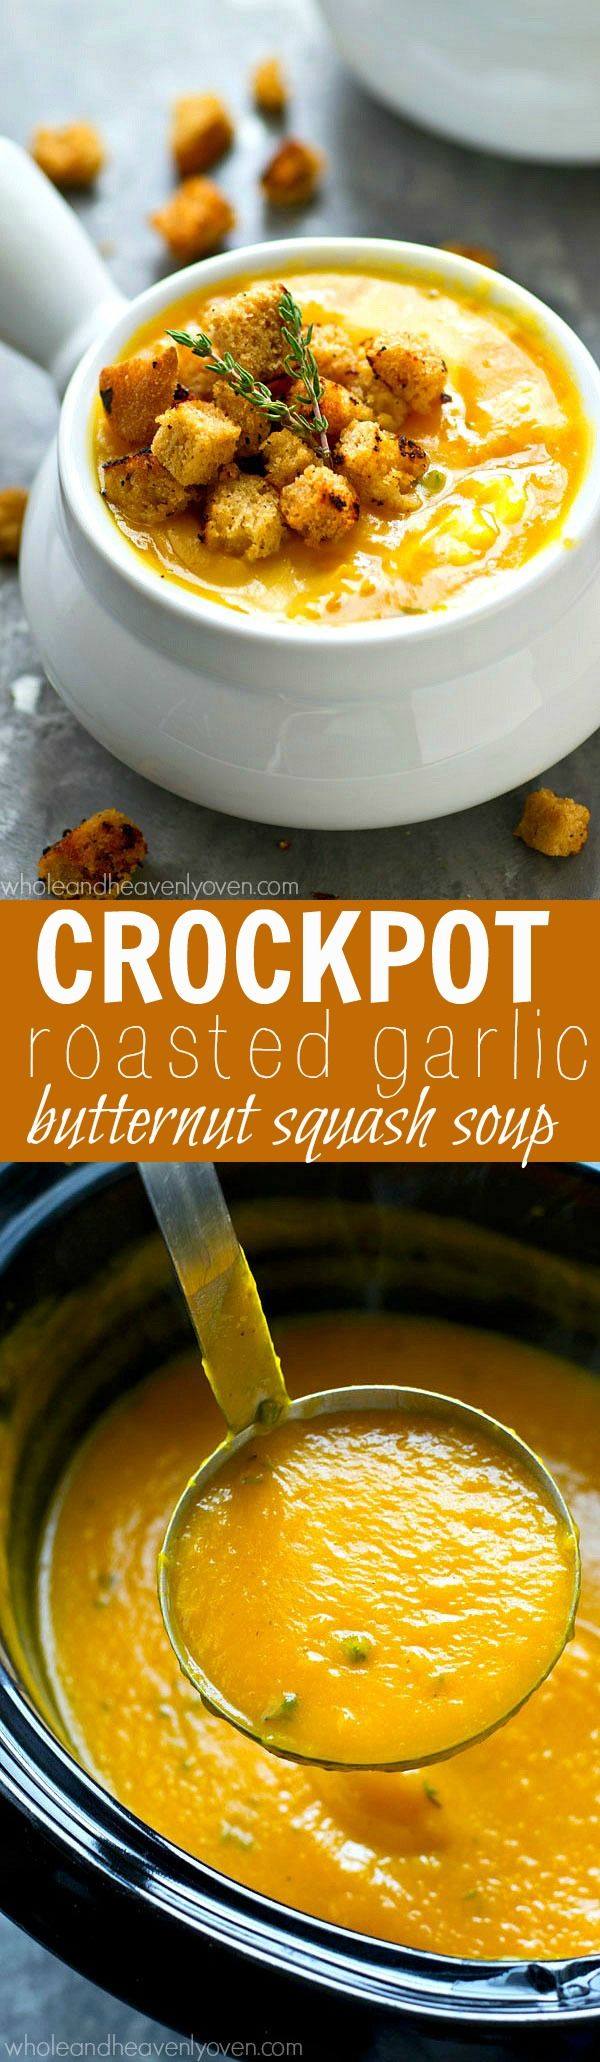 Crockpot Roasted Garlic Butternut Squash Soup